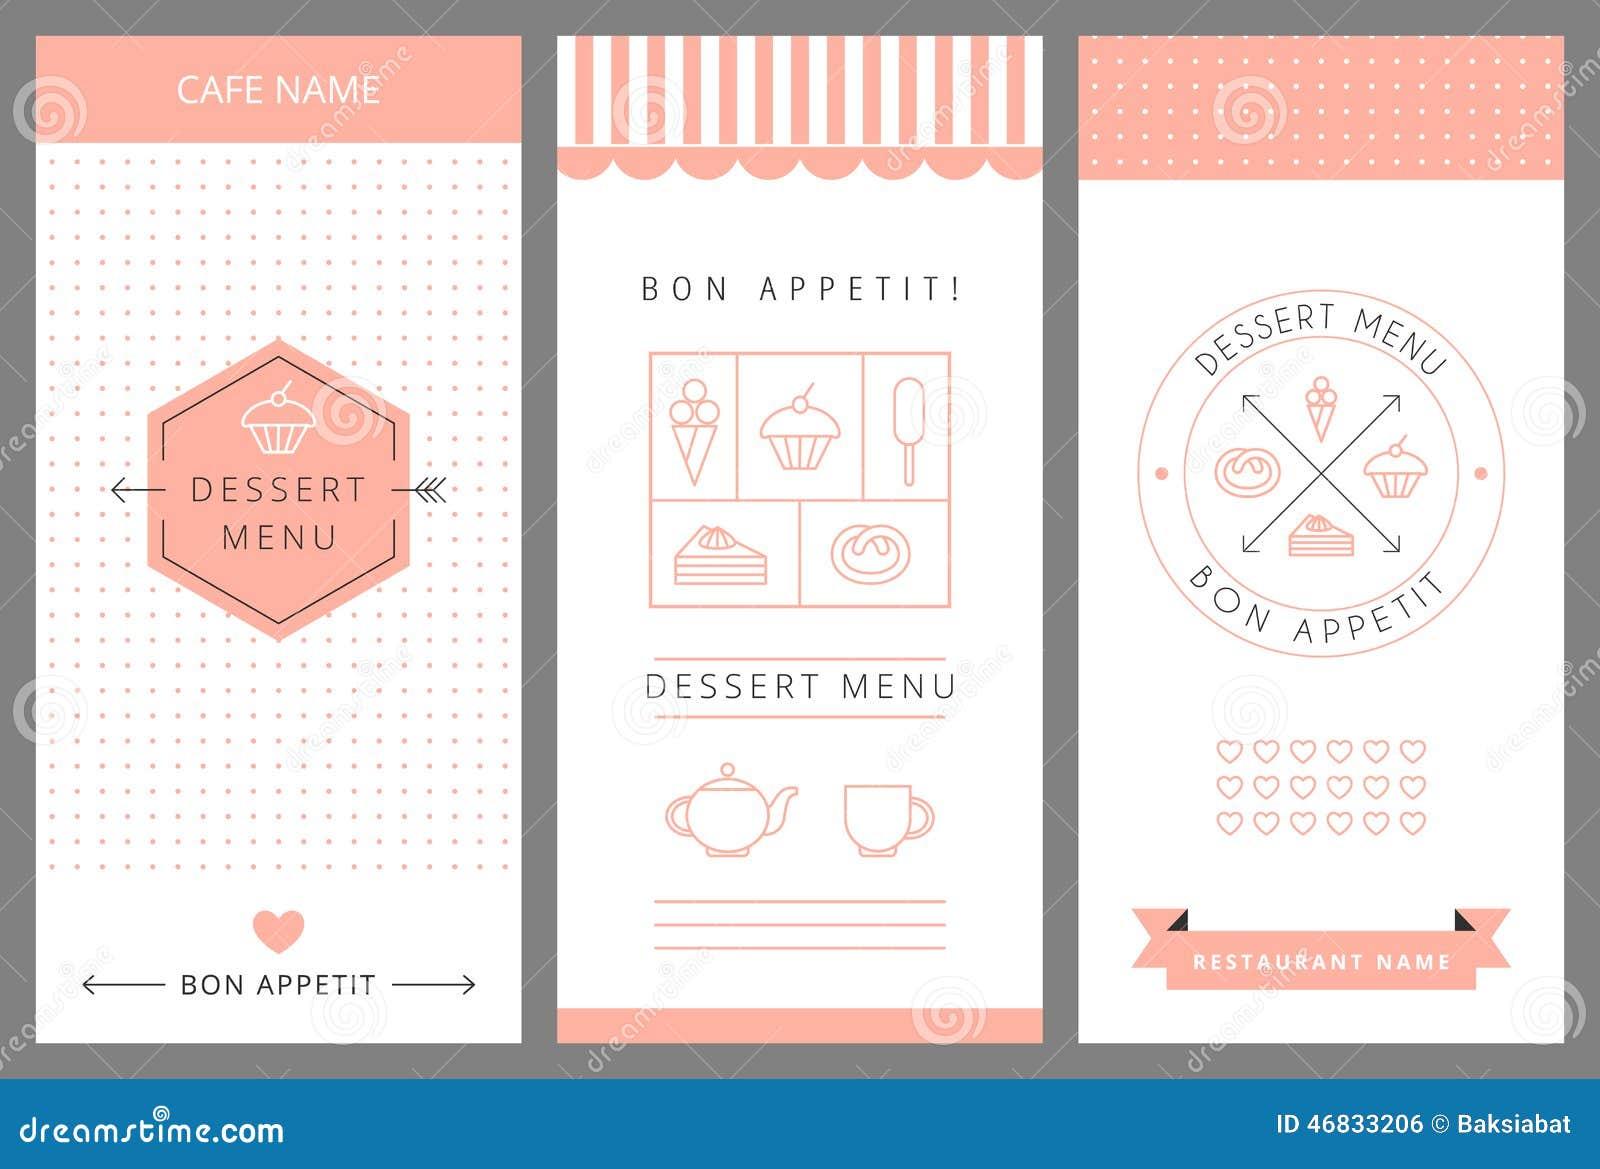 dessert menu card design template stock vector illustration of